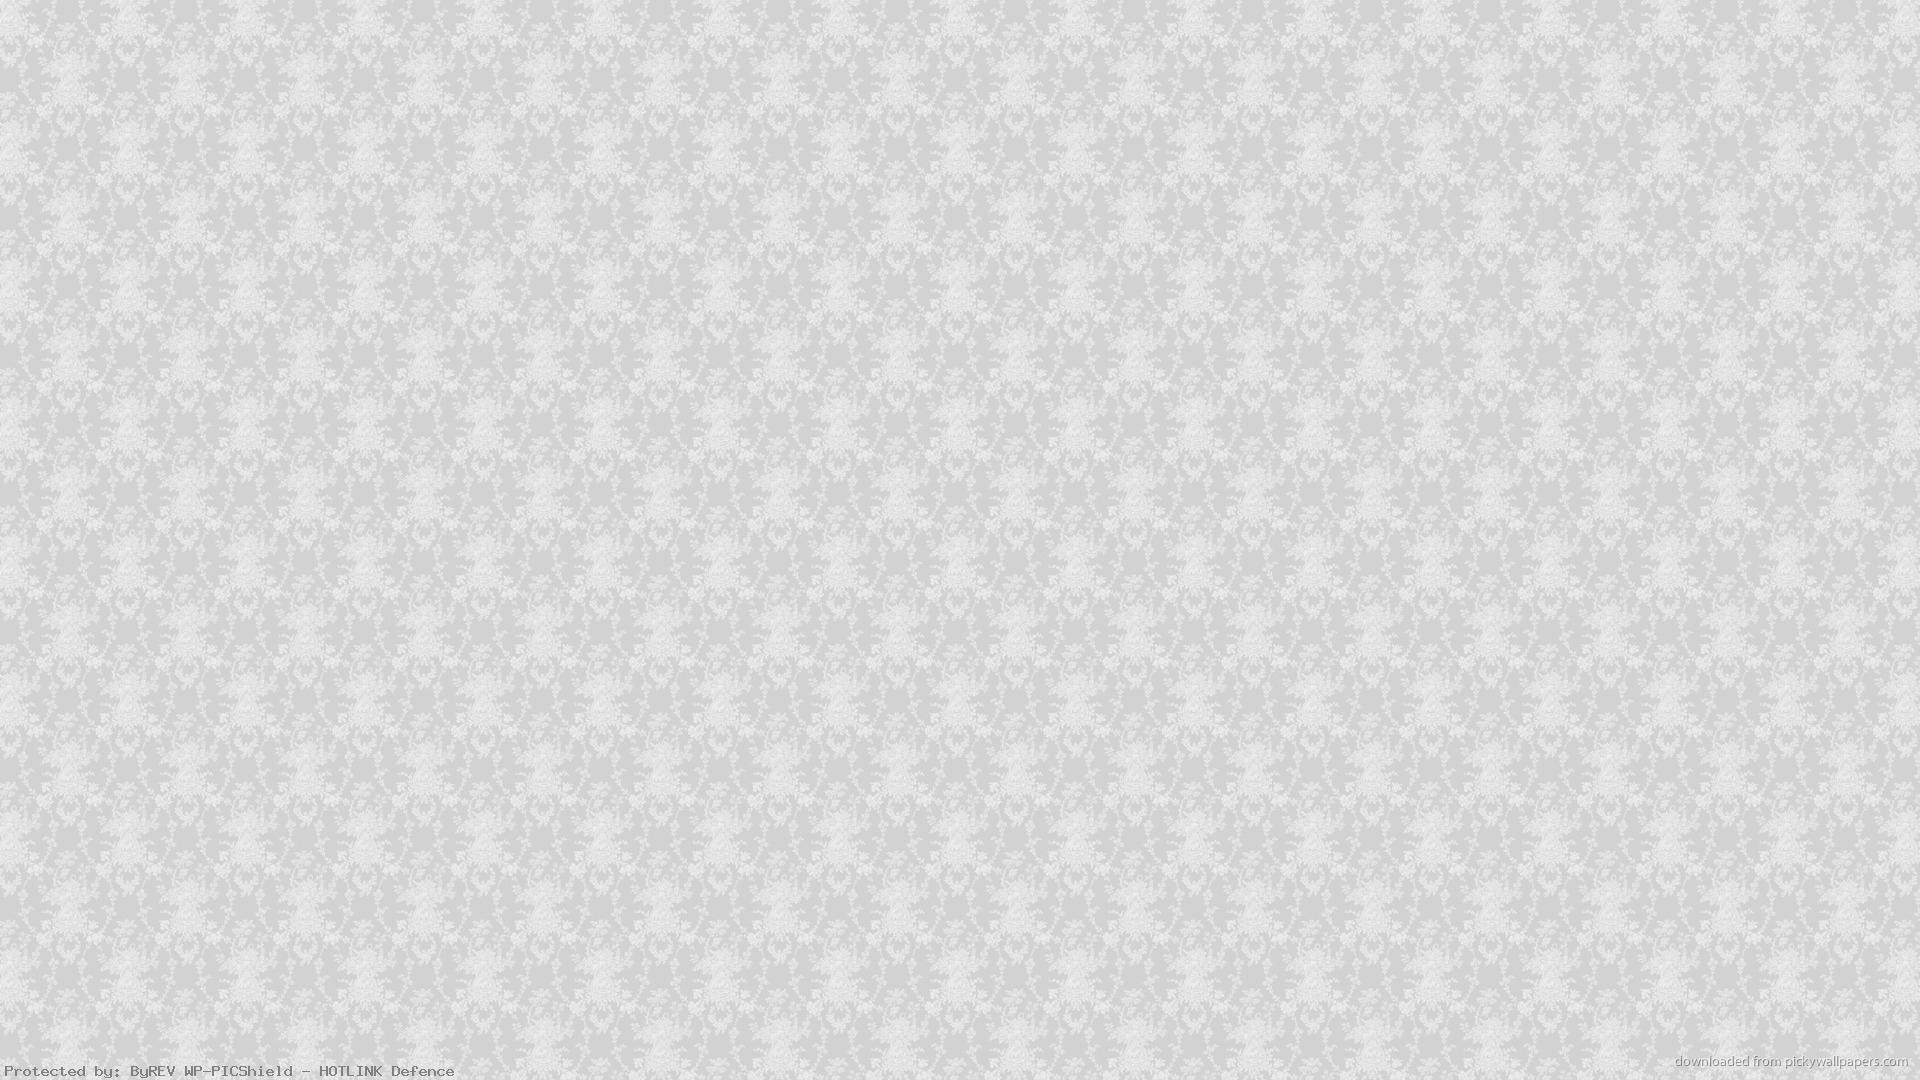 Best-background-pattern-light-Light-Background-Hd-Pattern-